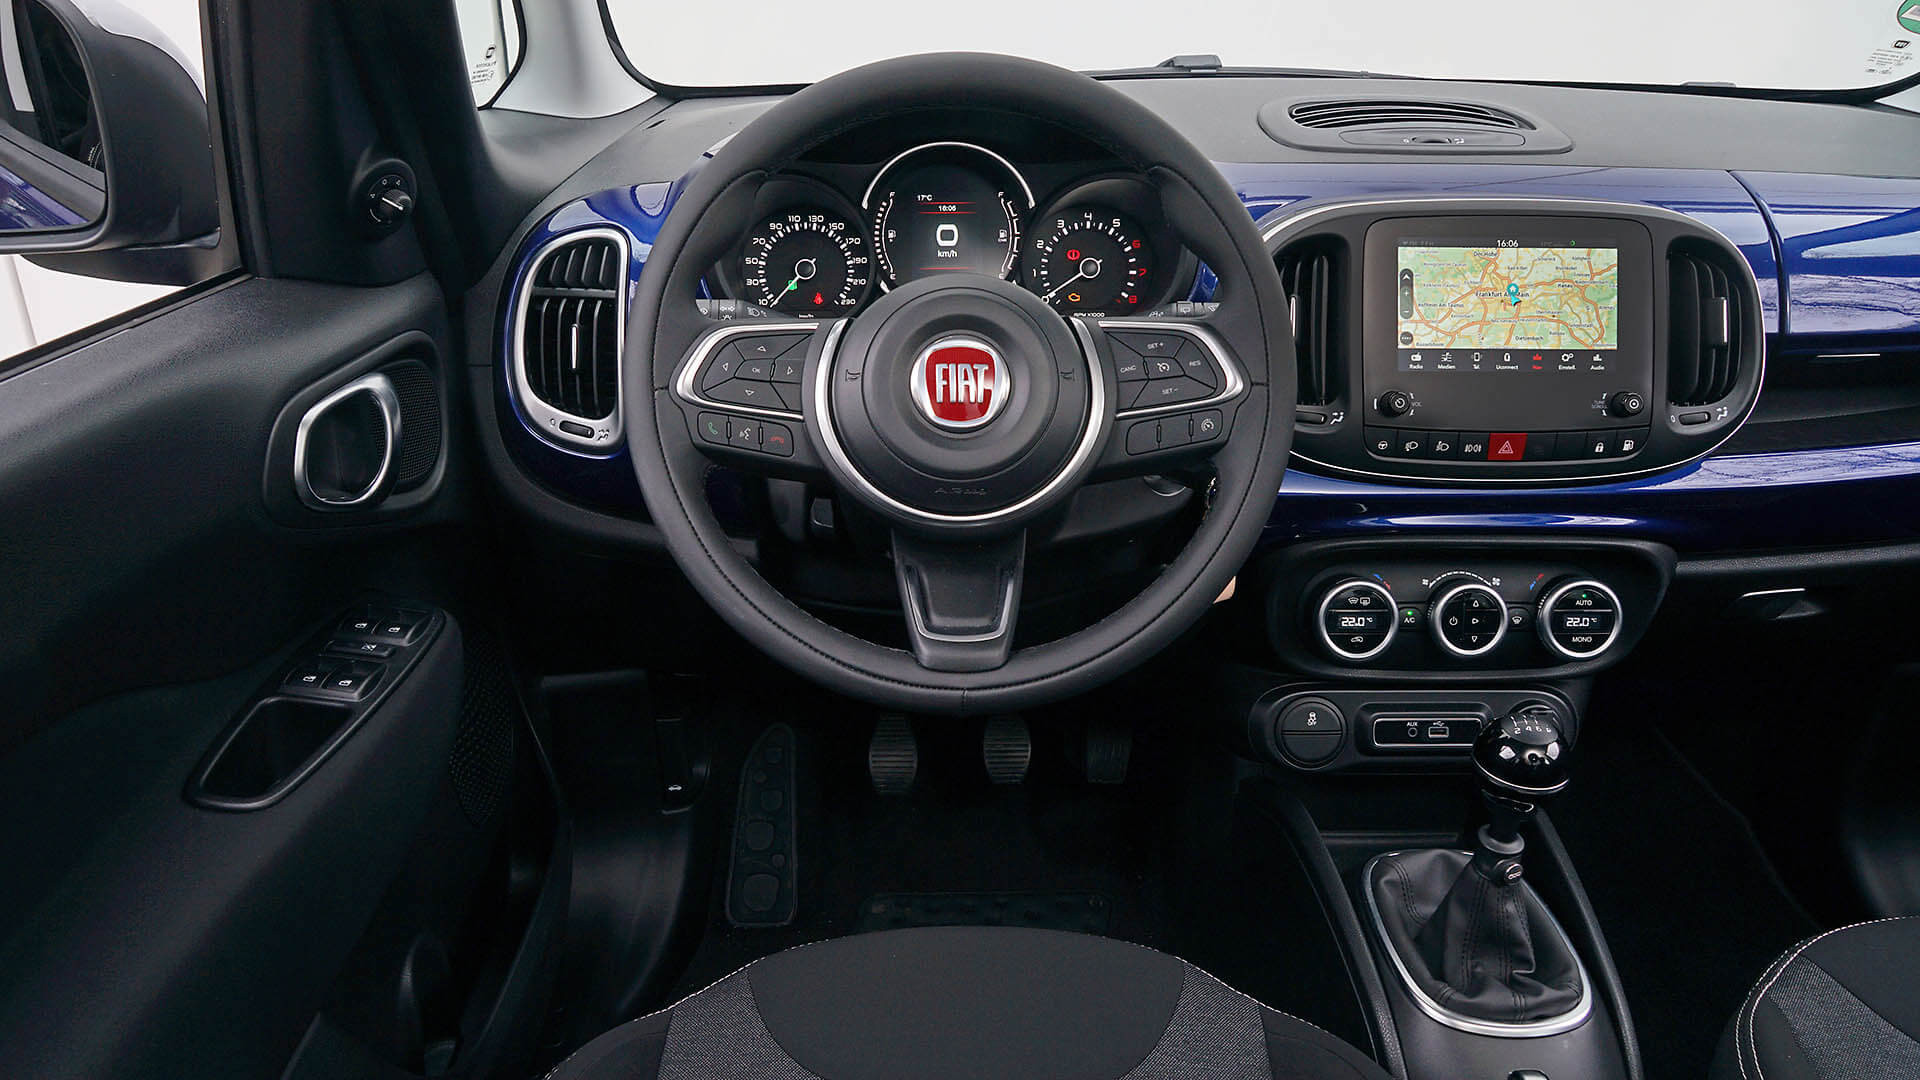 2020 Fiat 500L Research New